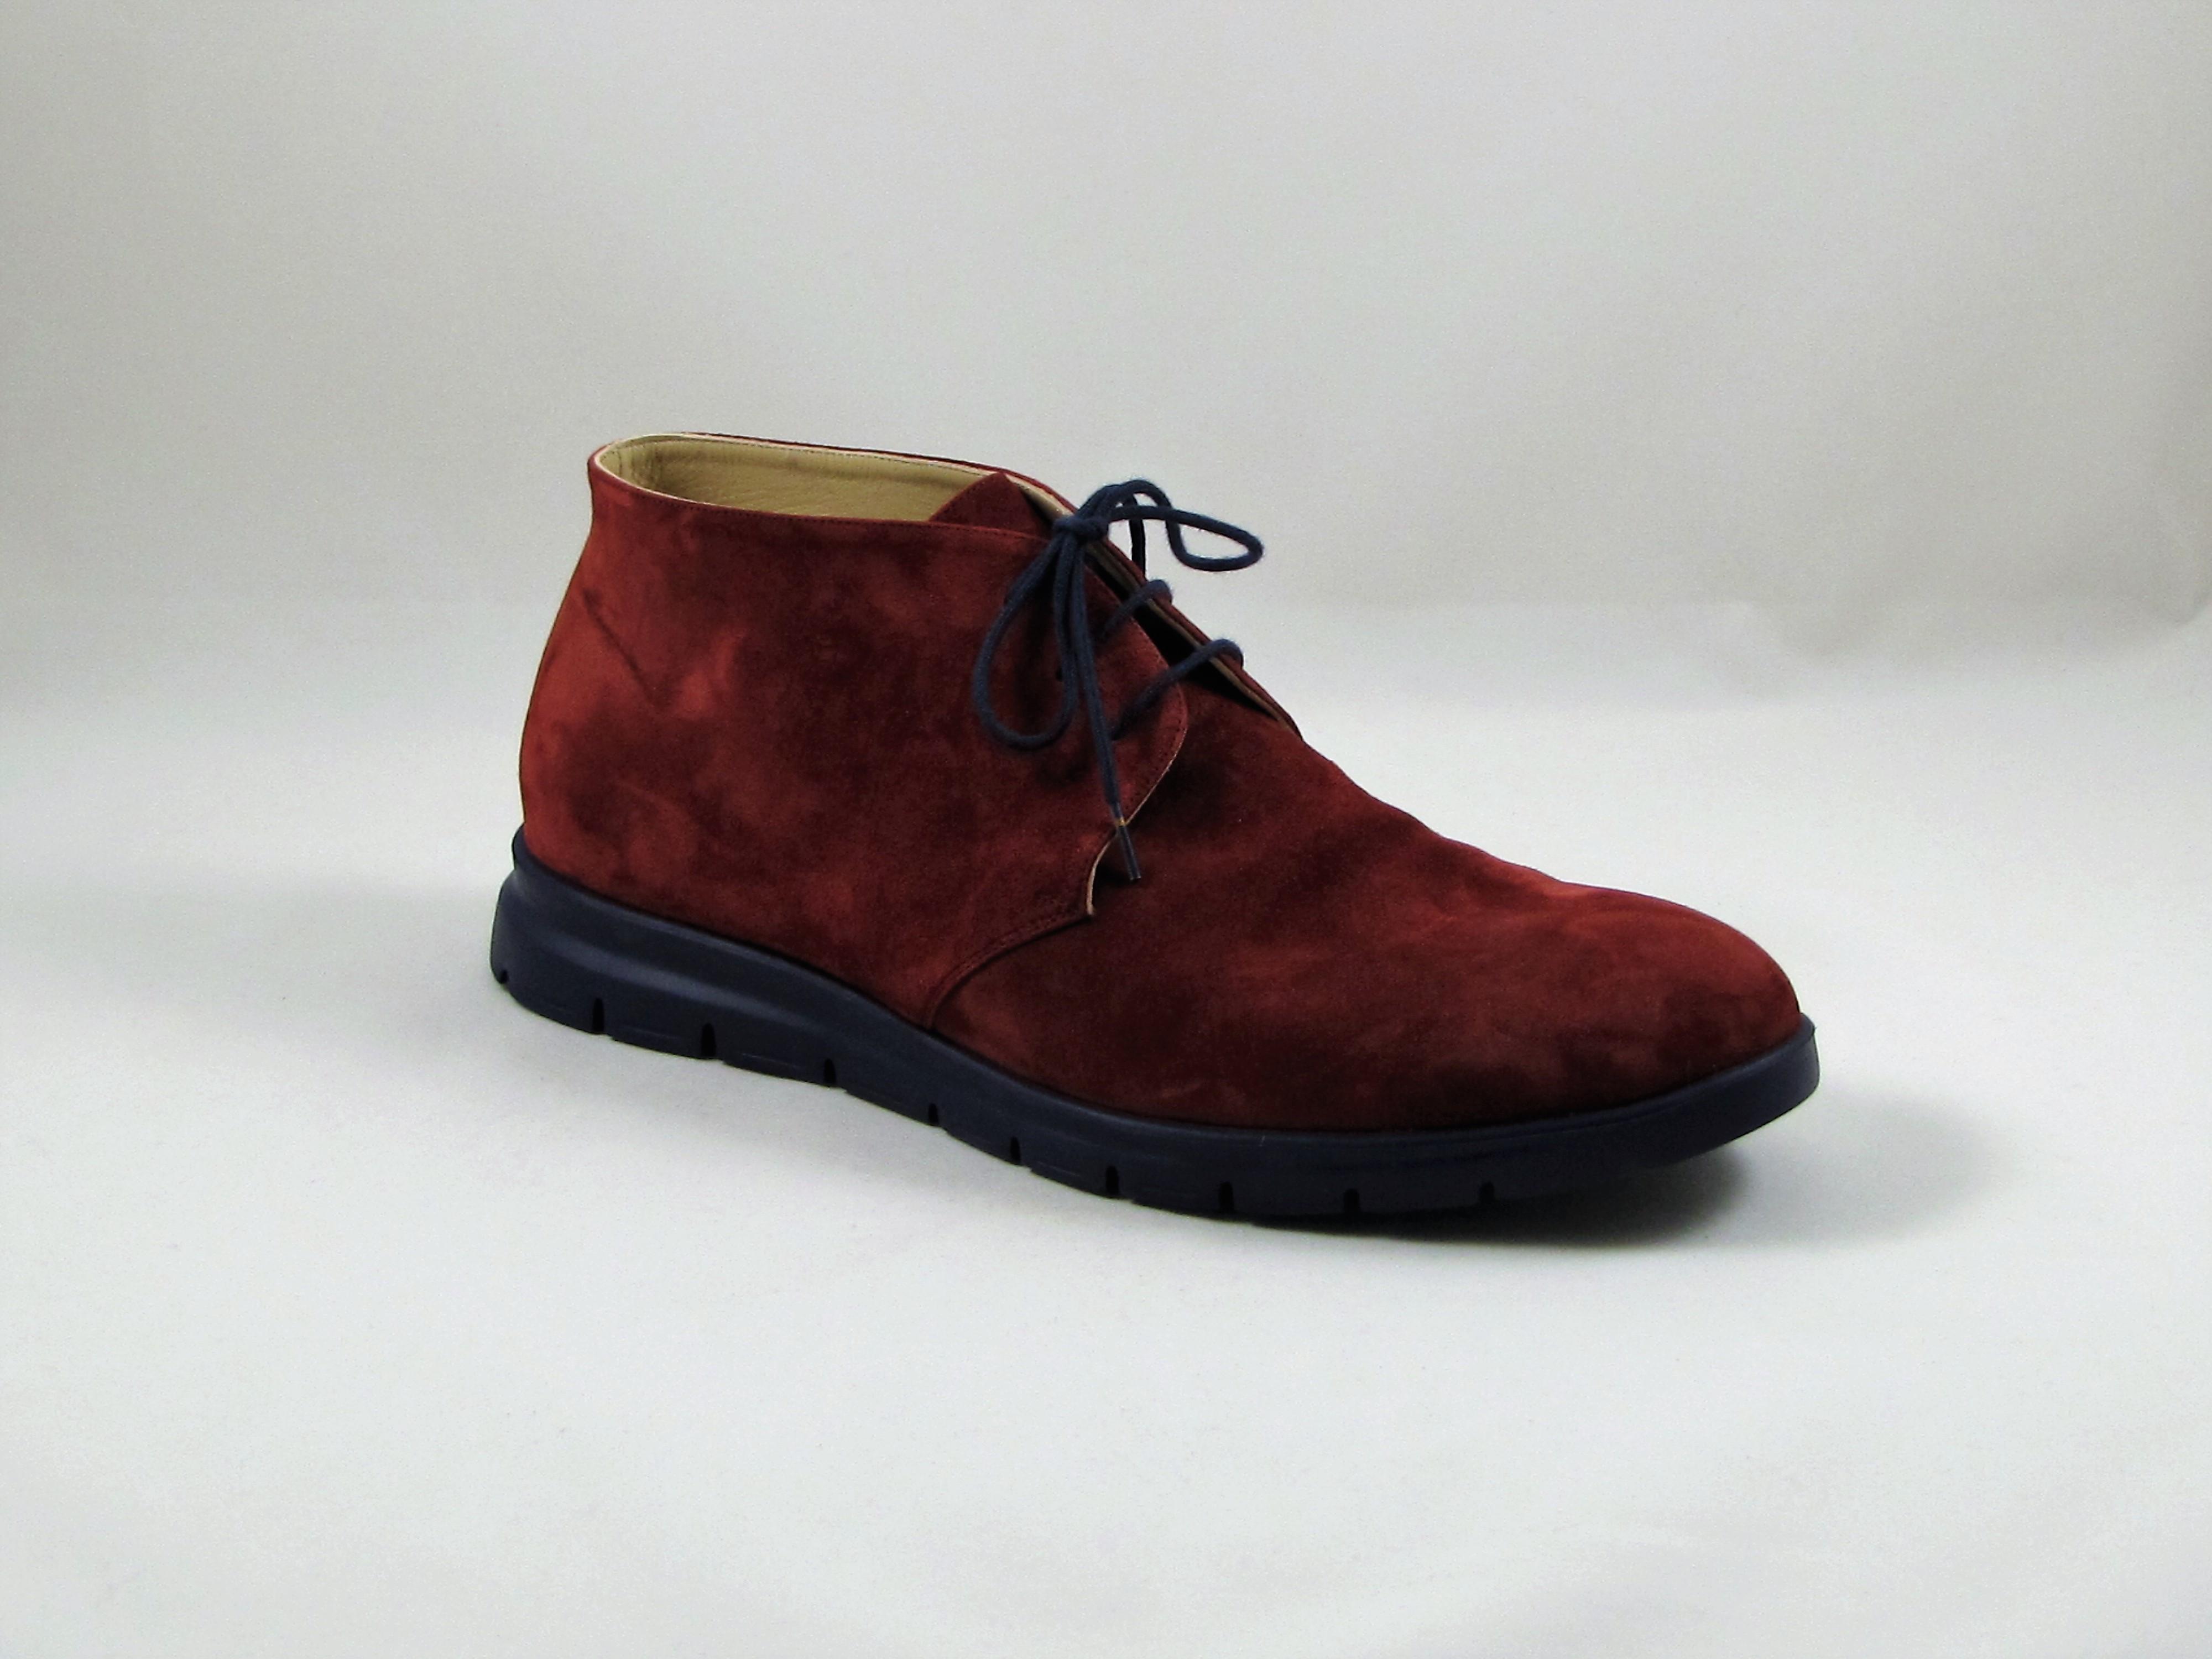 6093bae56e5 Thomas Shoes | Παπούτσια